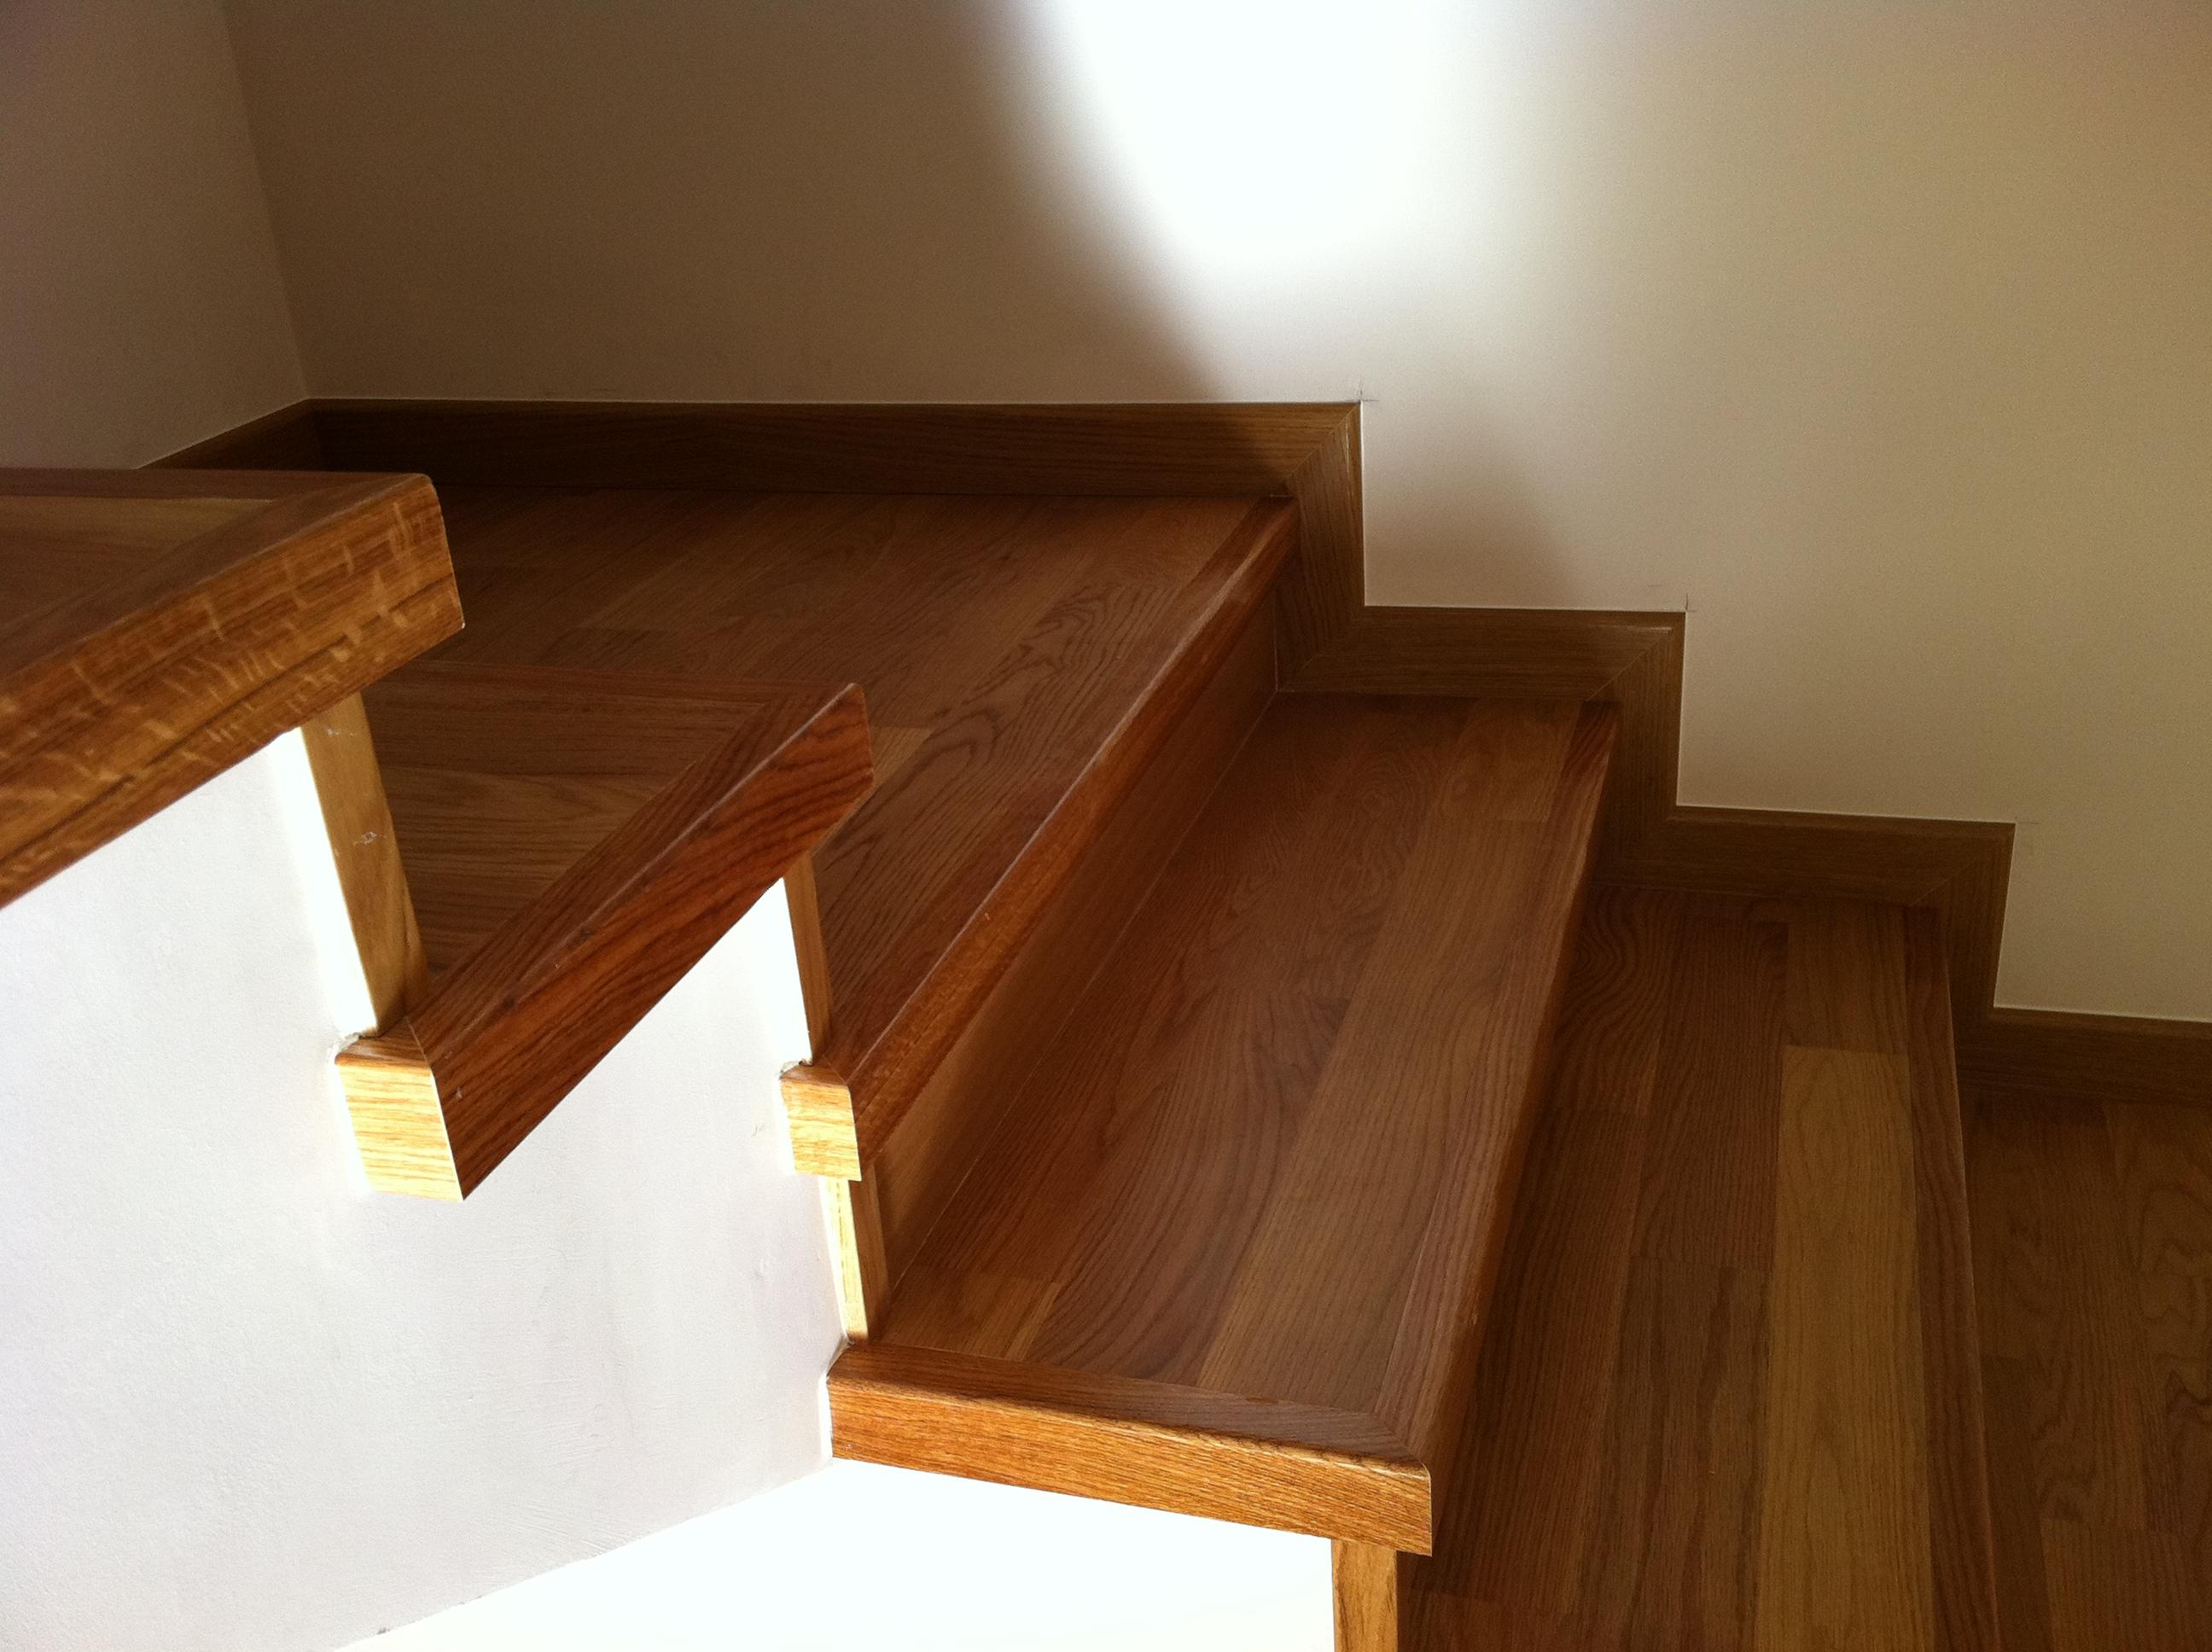 peldanos-de-madera-de-roble-a-medida